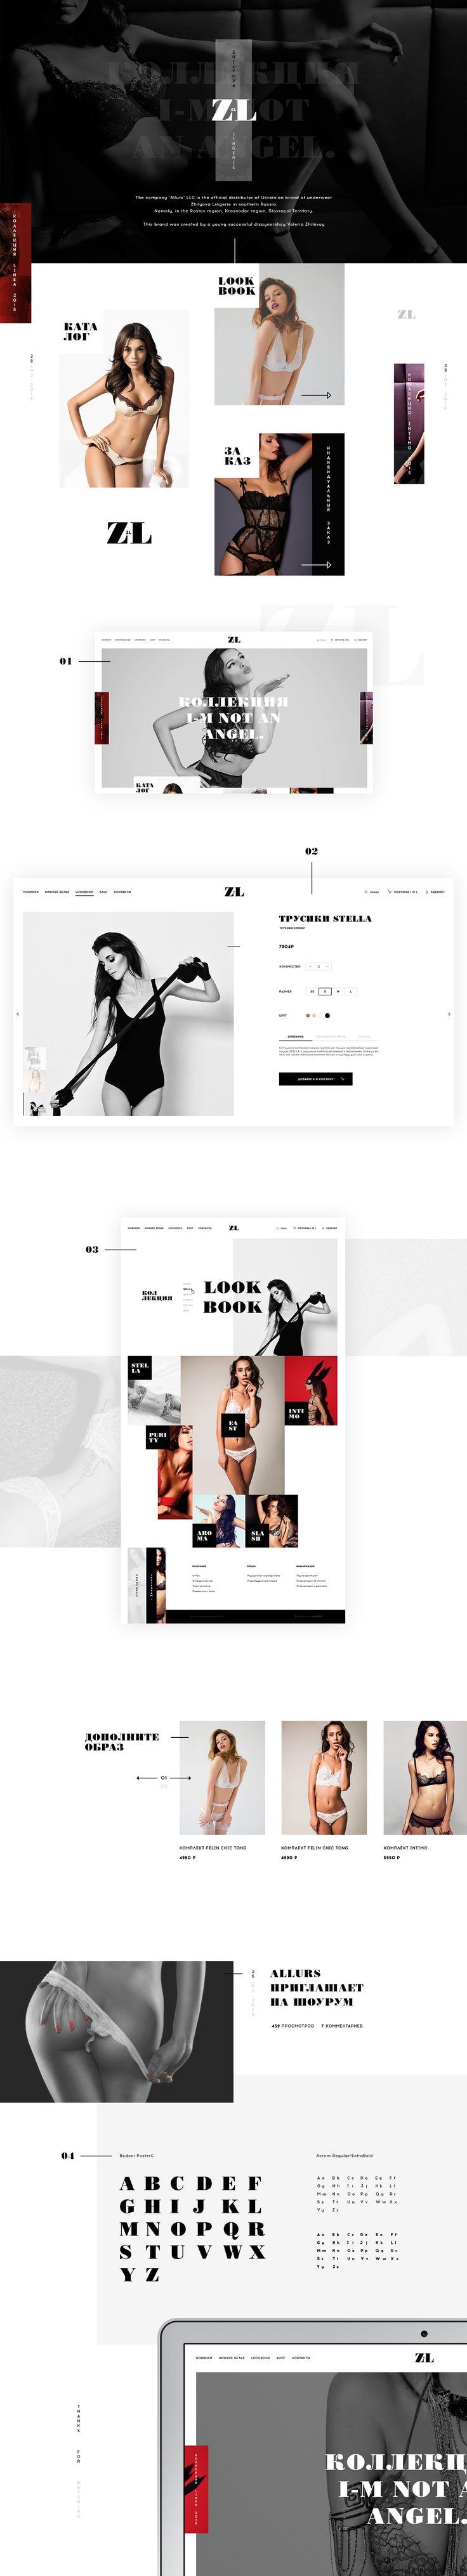 Best 25+ Lingerie company ideas on Pinterest | French lingerie ...